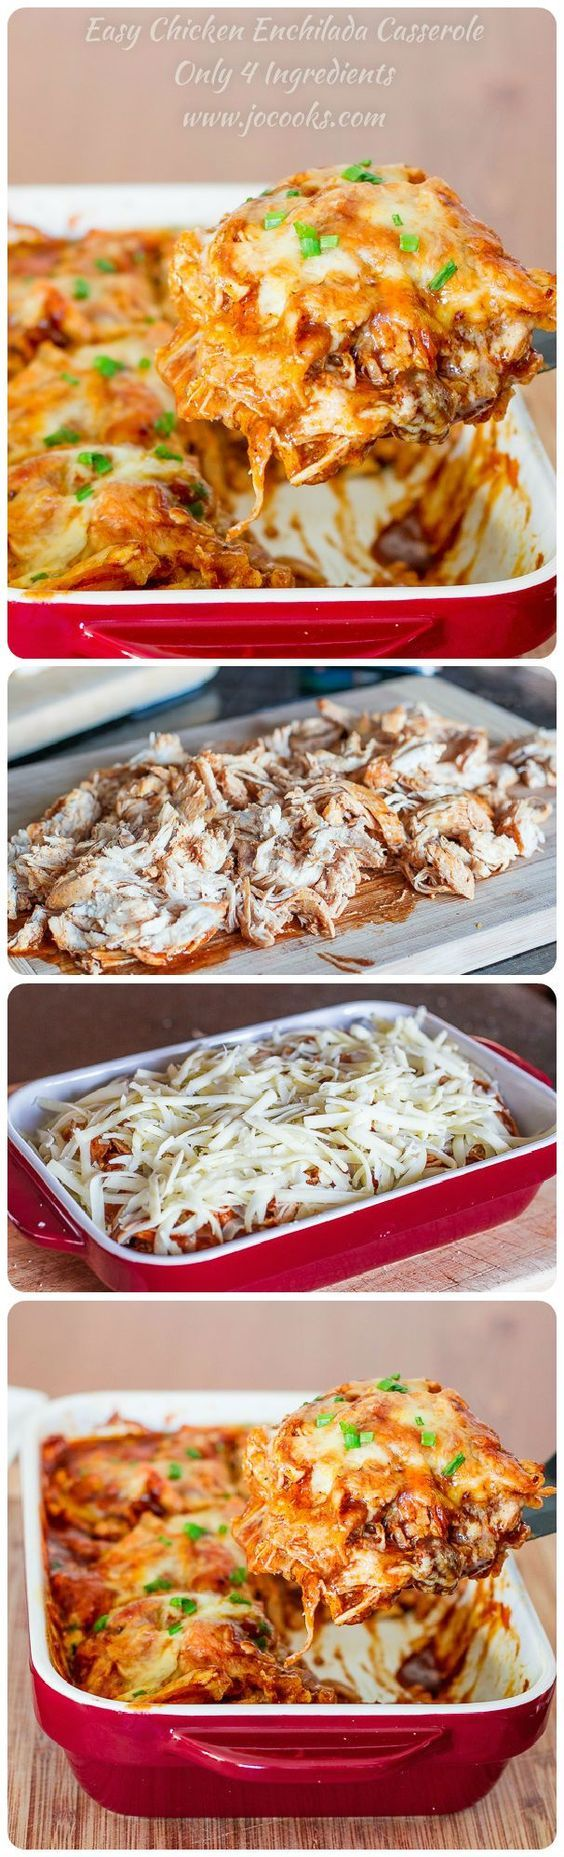 Easy chicken enchilada casserole #chickenbreastrecipeseasy